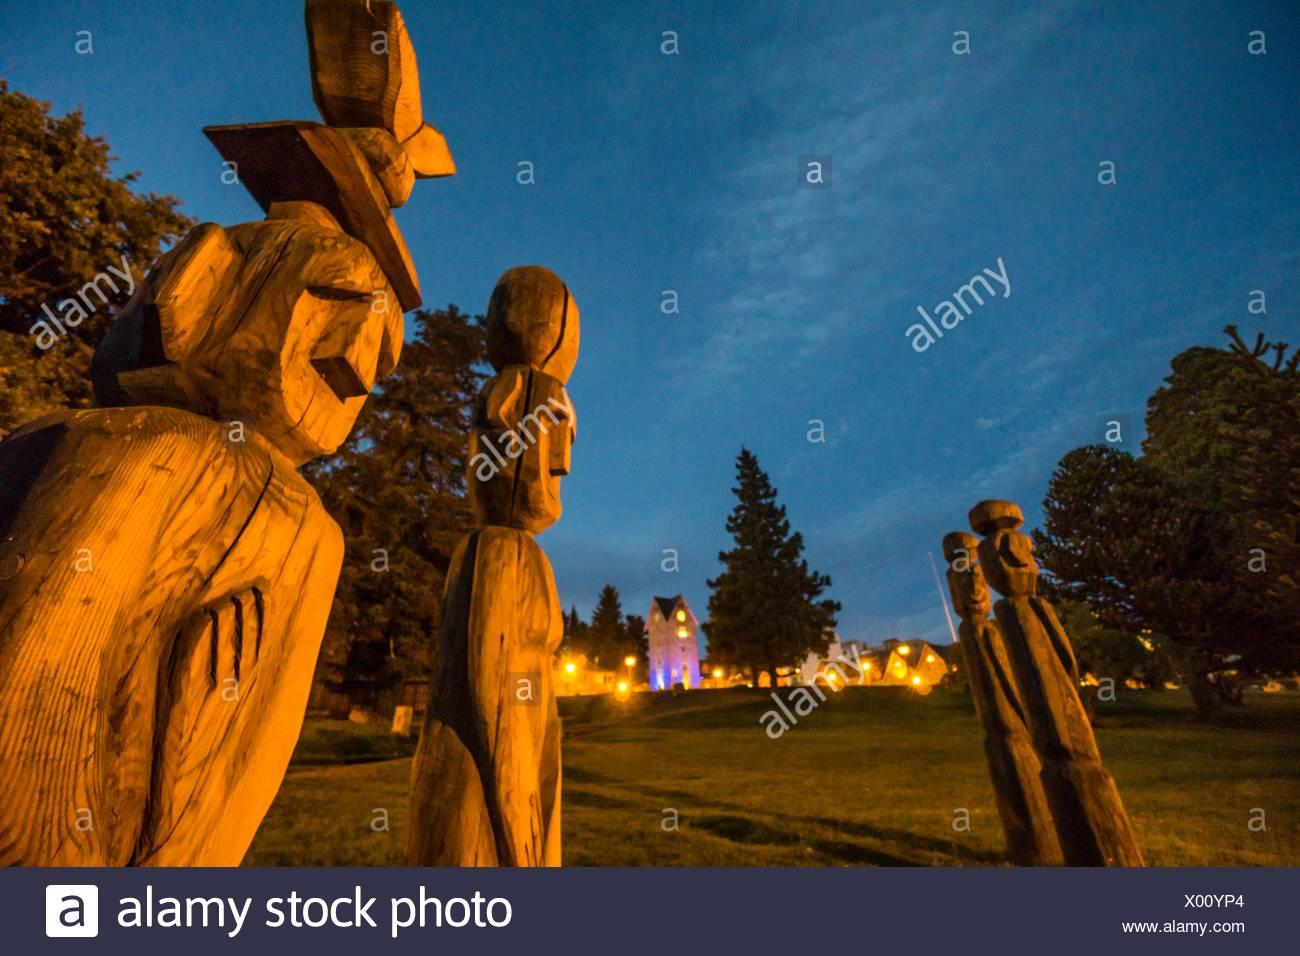 ´Chemamull´ carved wooden statues by Bernardo Oyarzún, San Carlos de Bariloche, Río Negro, Patagonia, Argentina - Stock Image